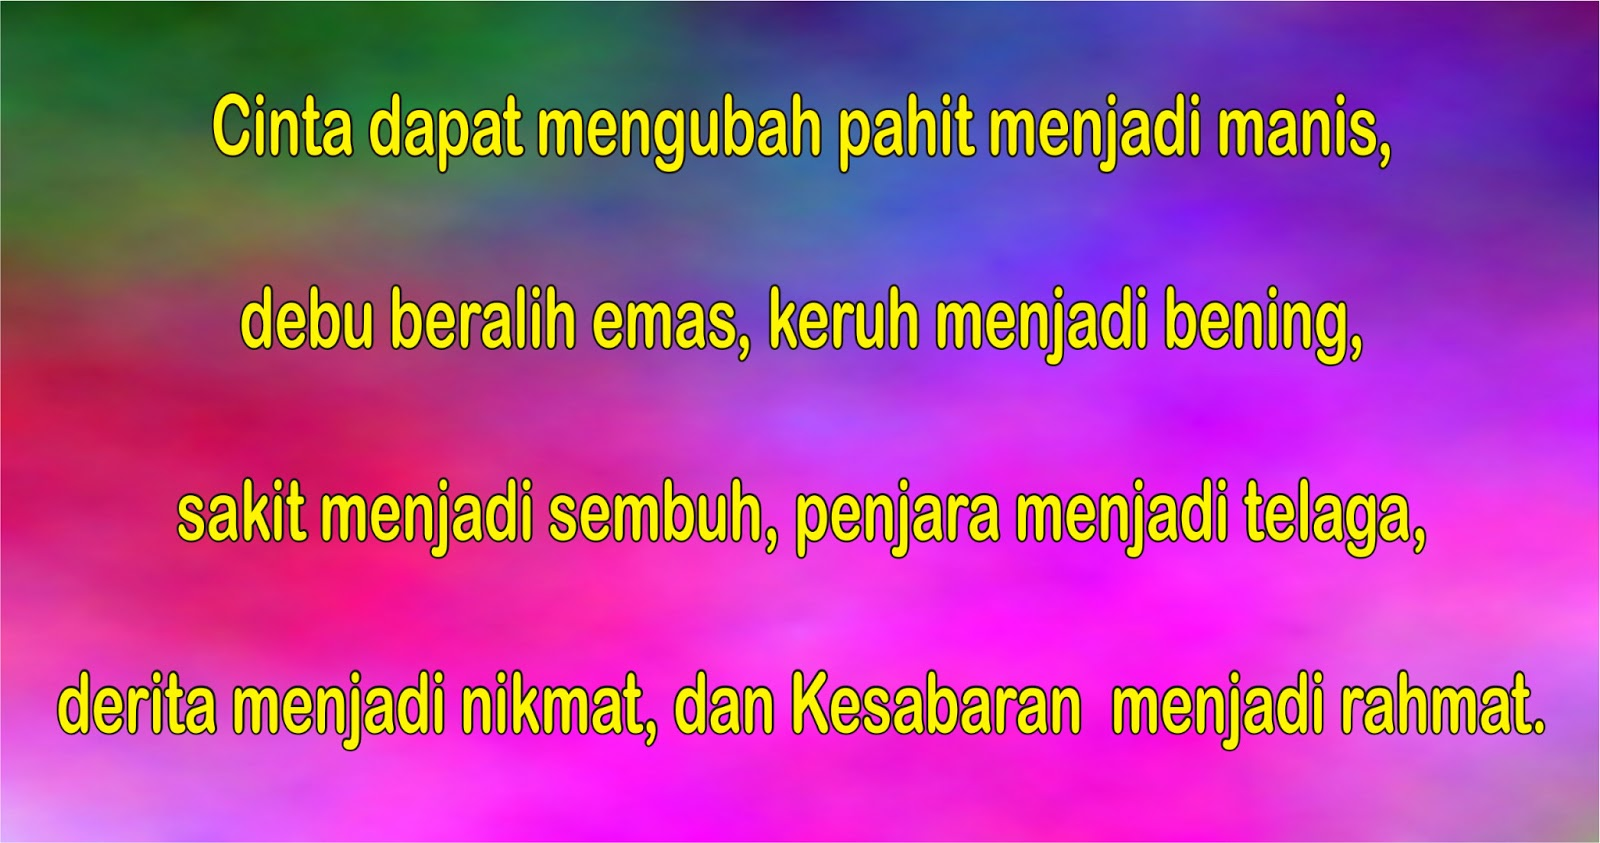 23 Kata Mutiara Fb Inspirations Kata Mutiara Terbaru